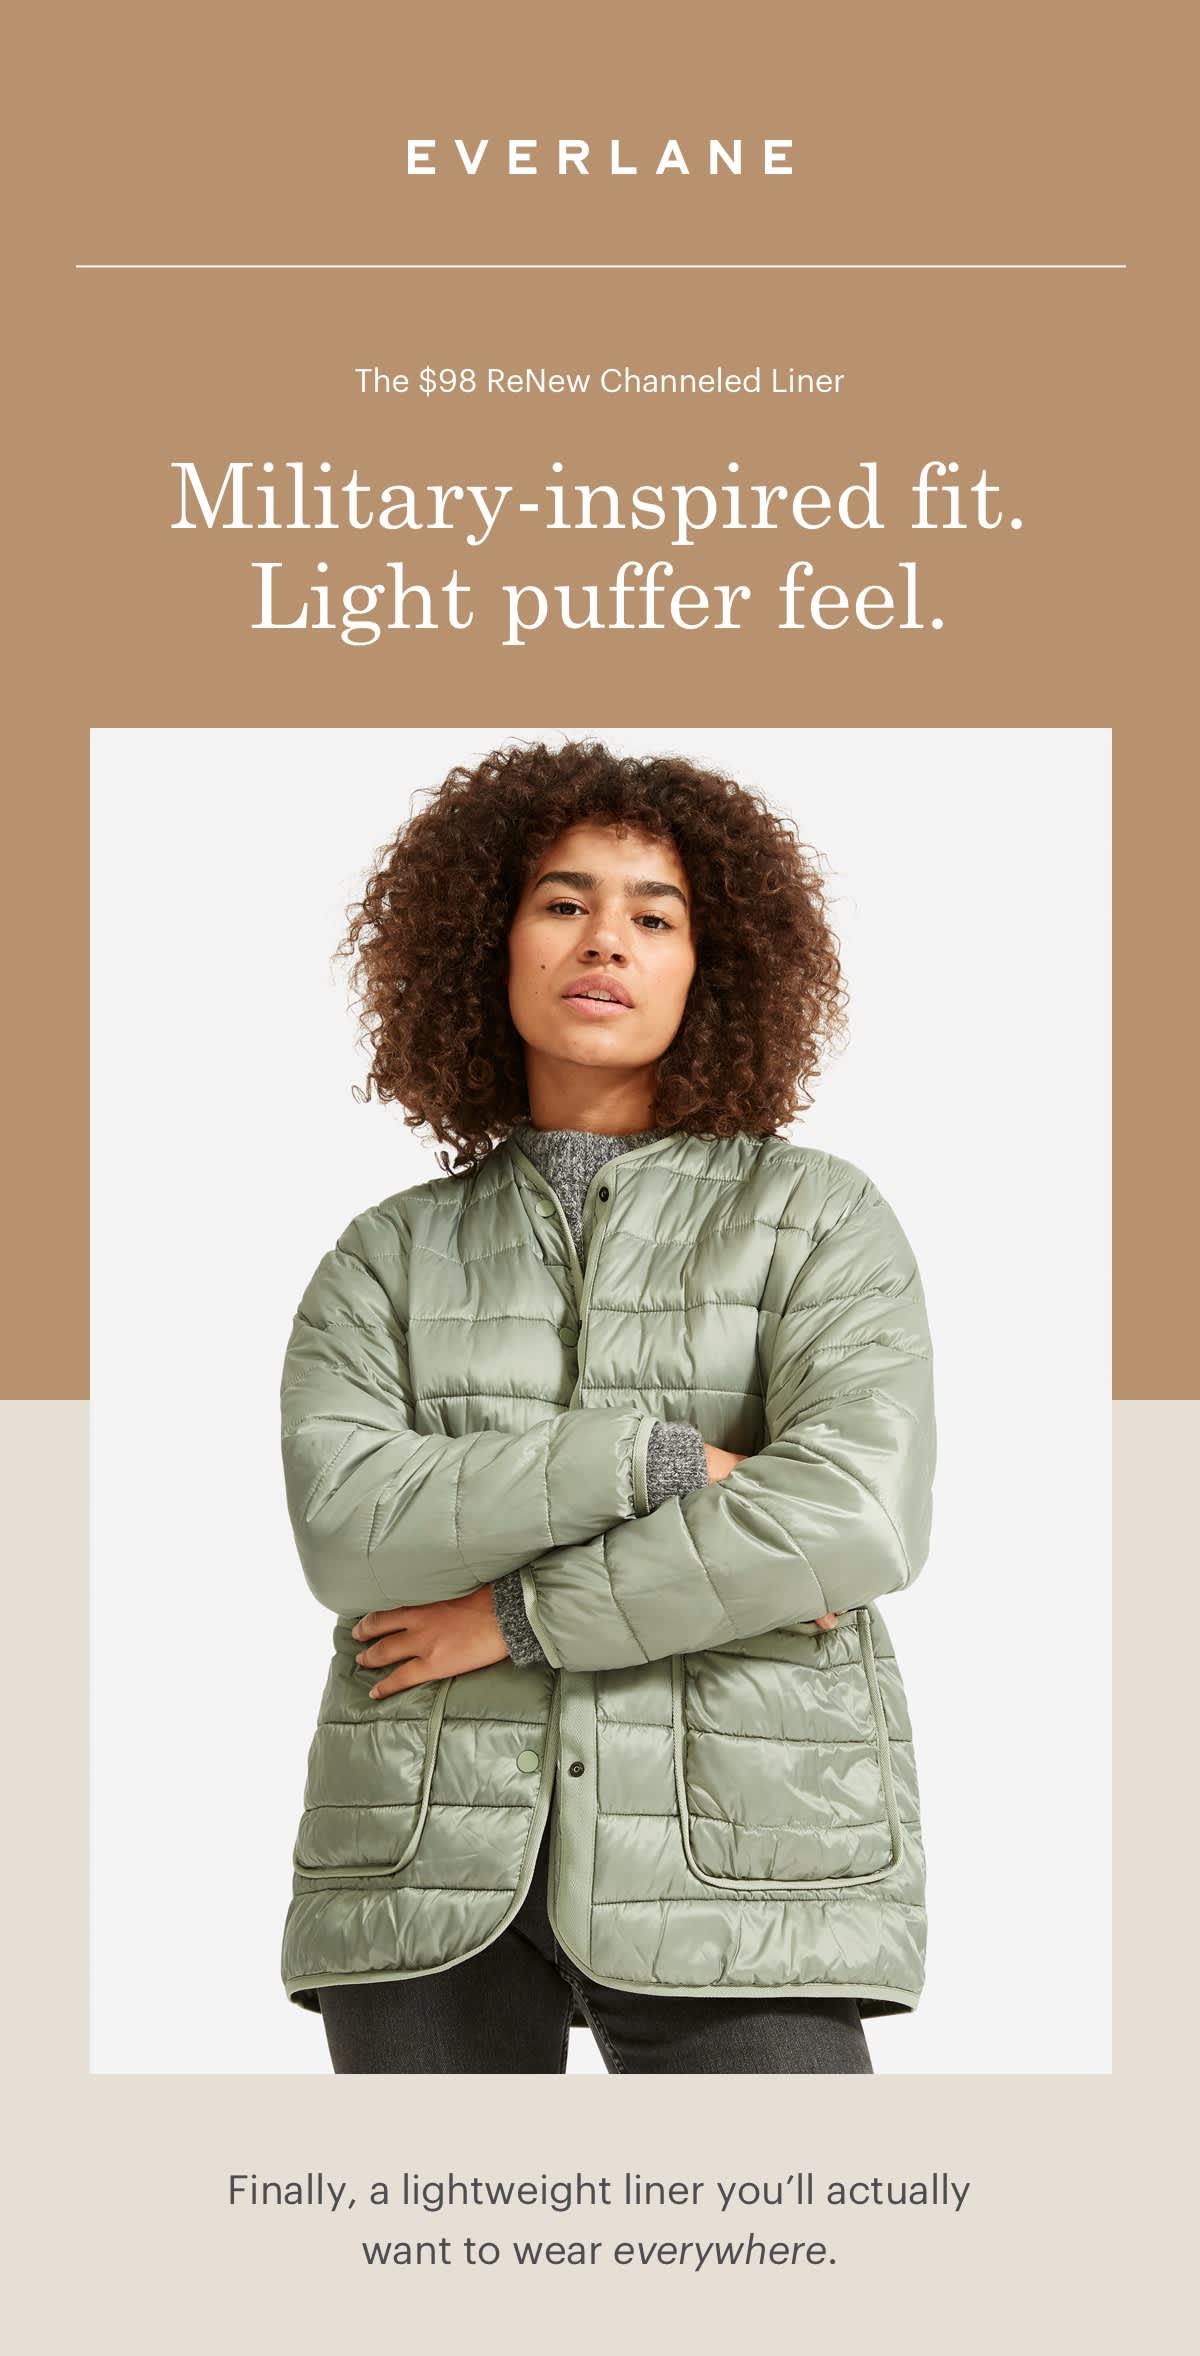 Military-inspired fit. Light puffer feel.